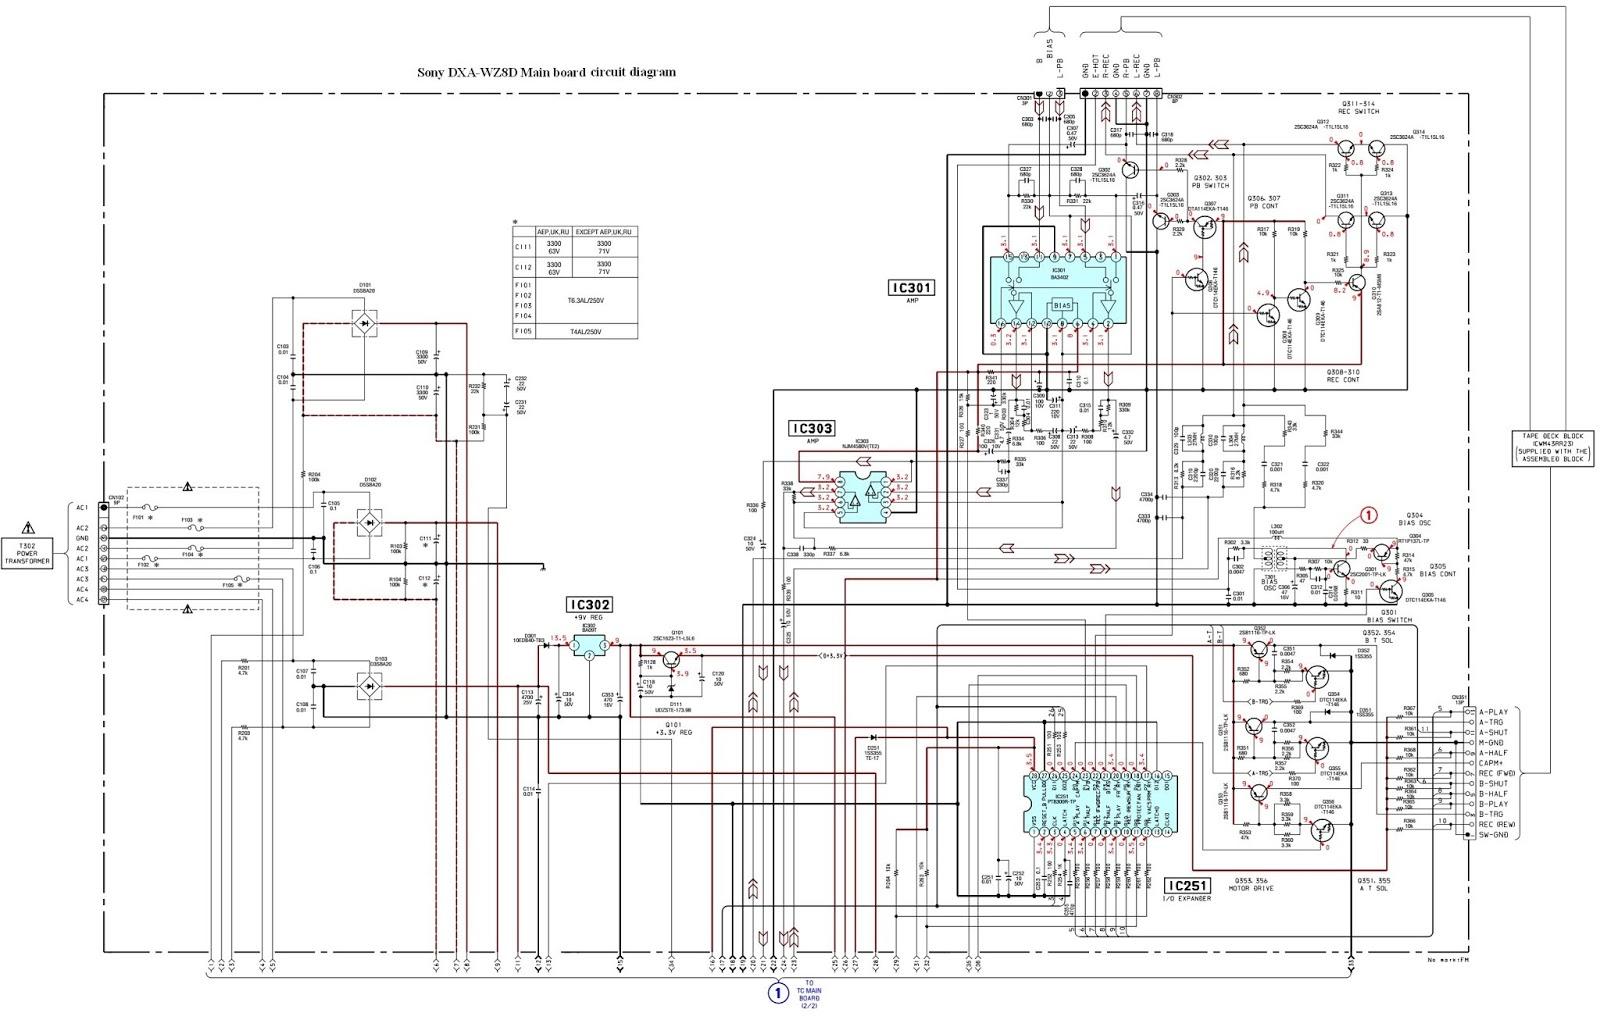 Sony Amplifier Circuit Diagram Electrical Wiring Diagrams Current Amplifiercircuit Seekiccom Dxa Wz8d Deck And Schematic